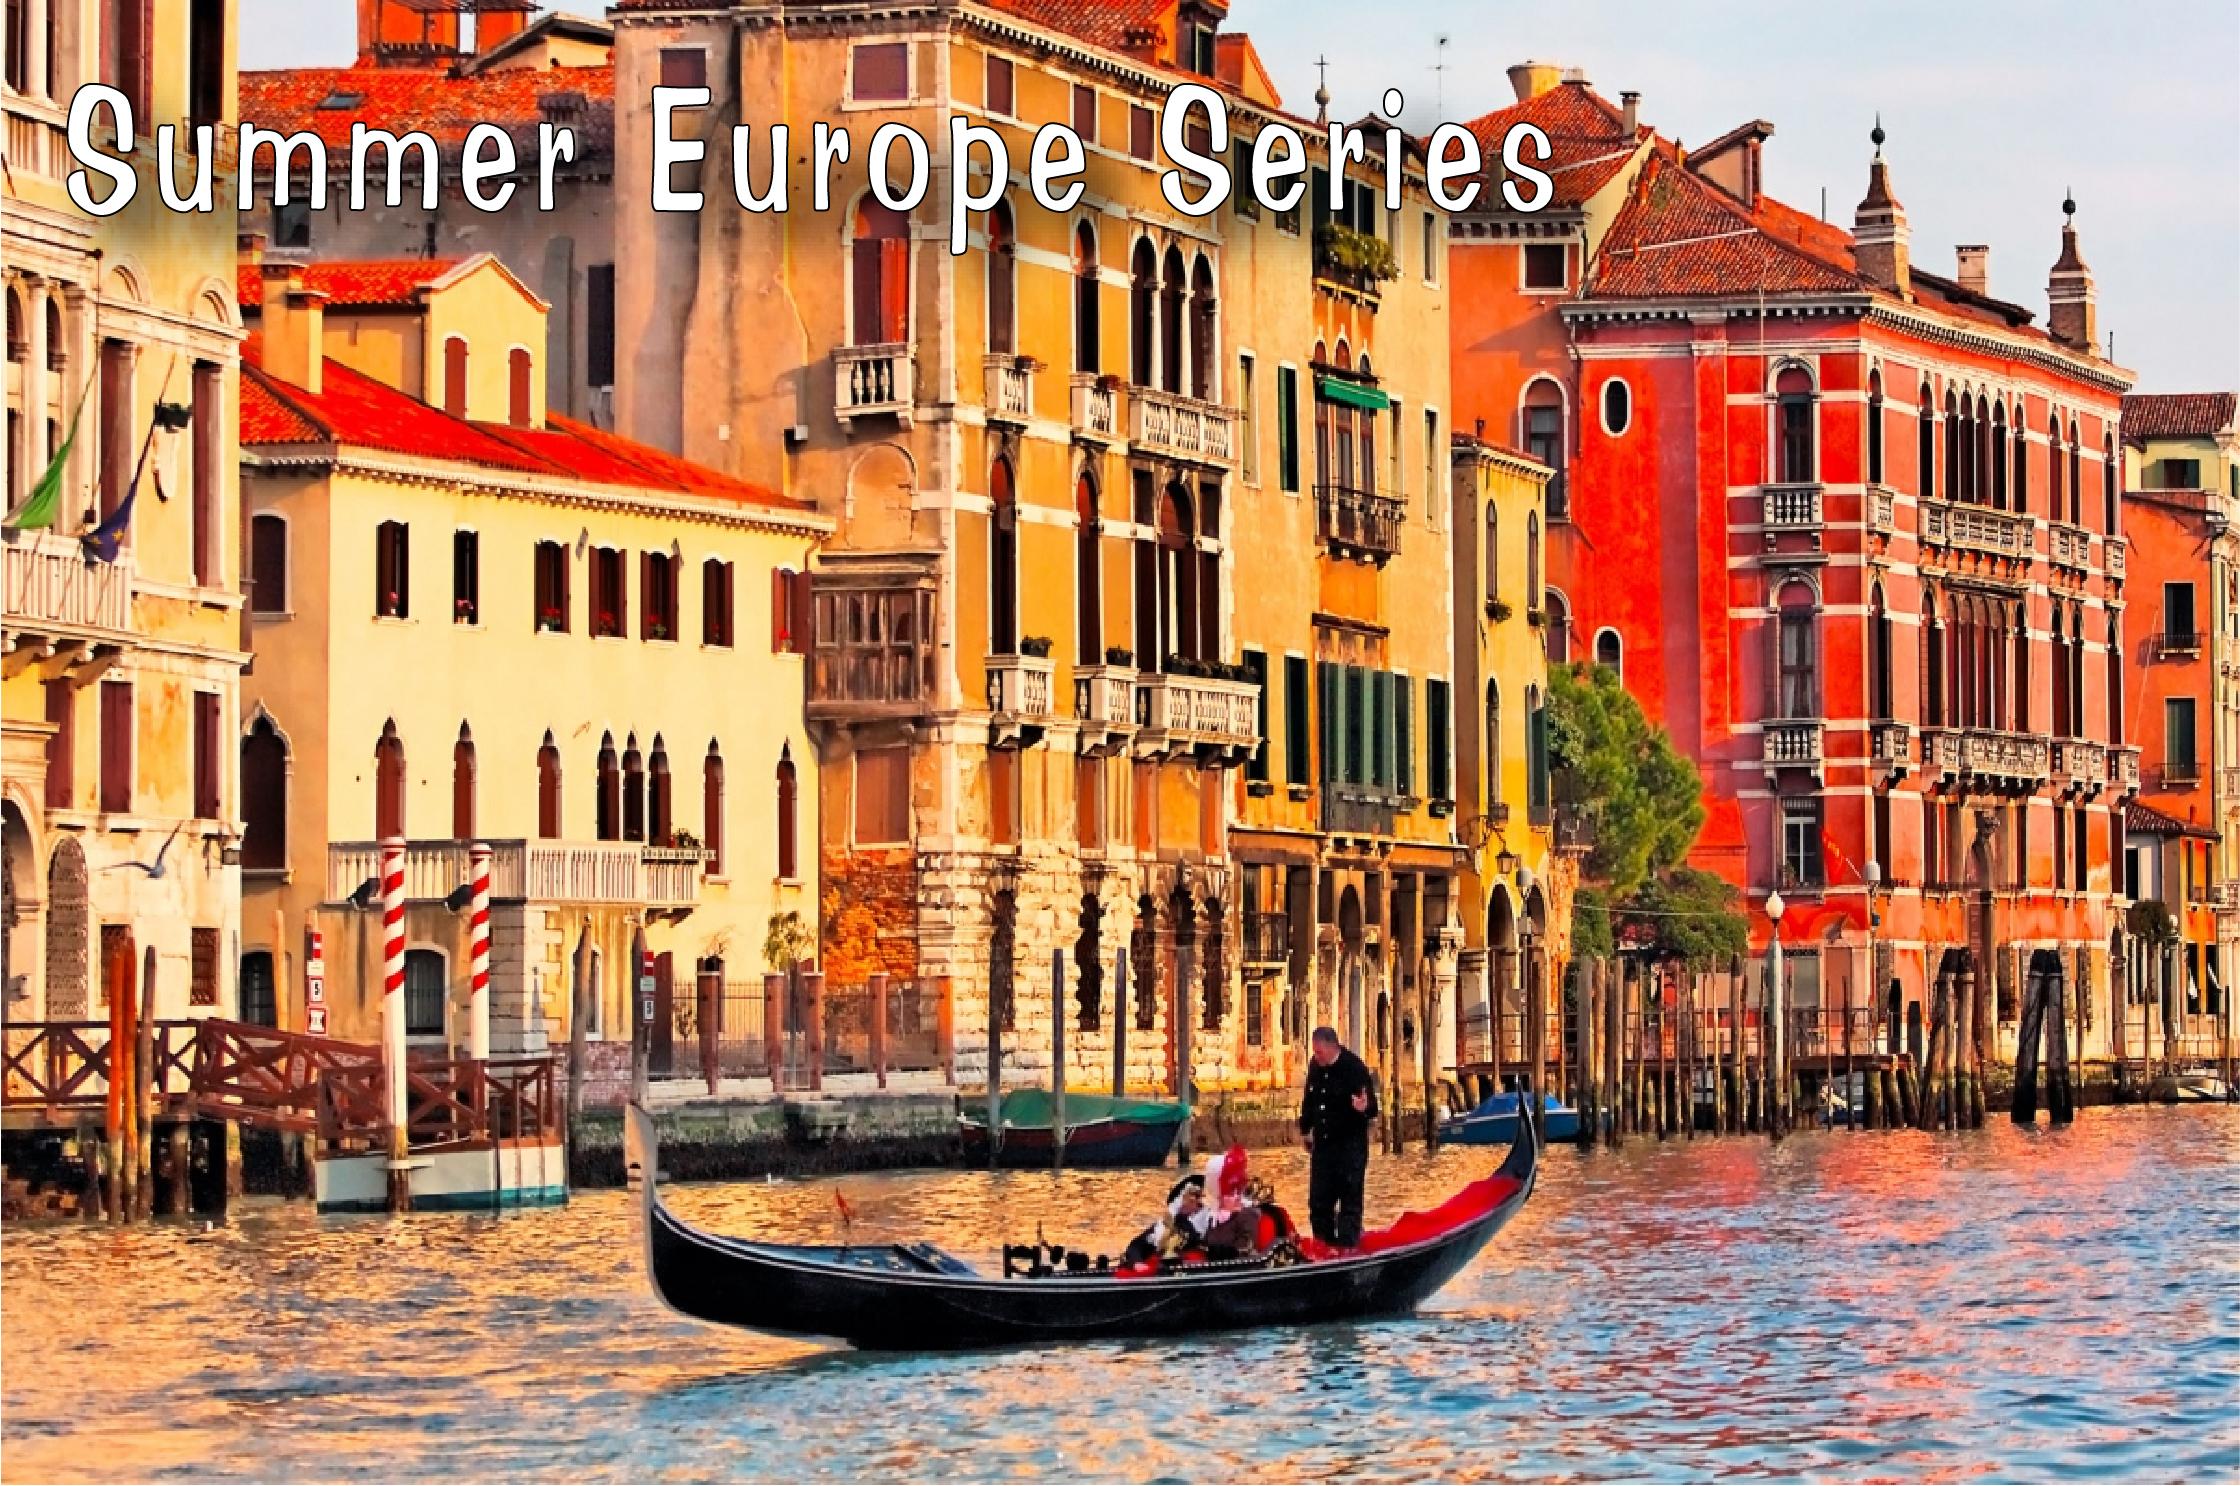 Summer Europe Series